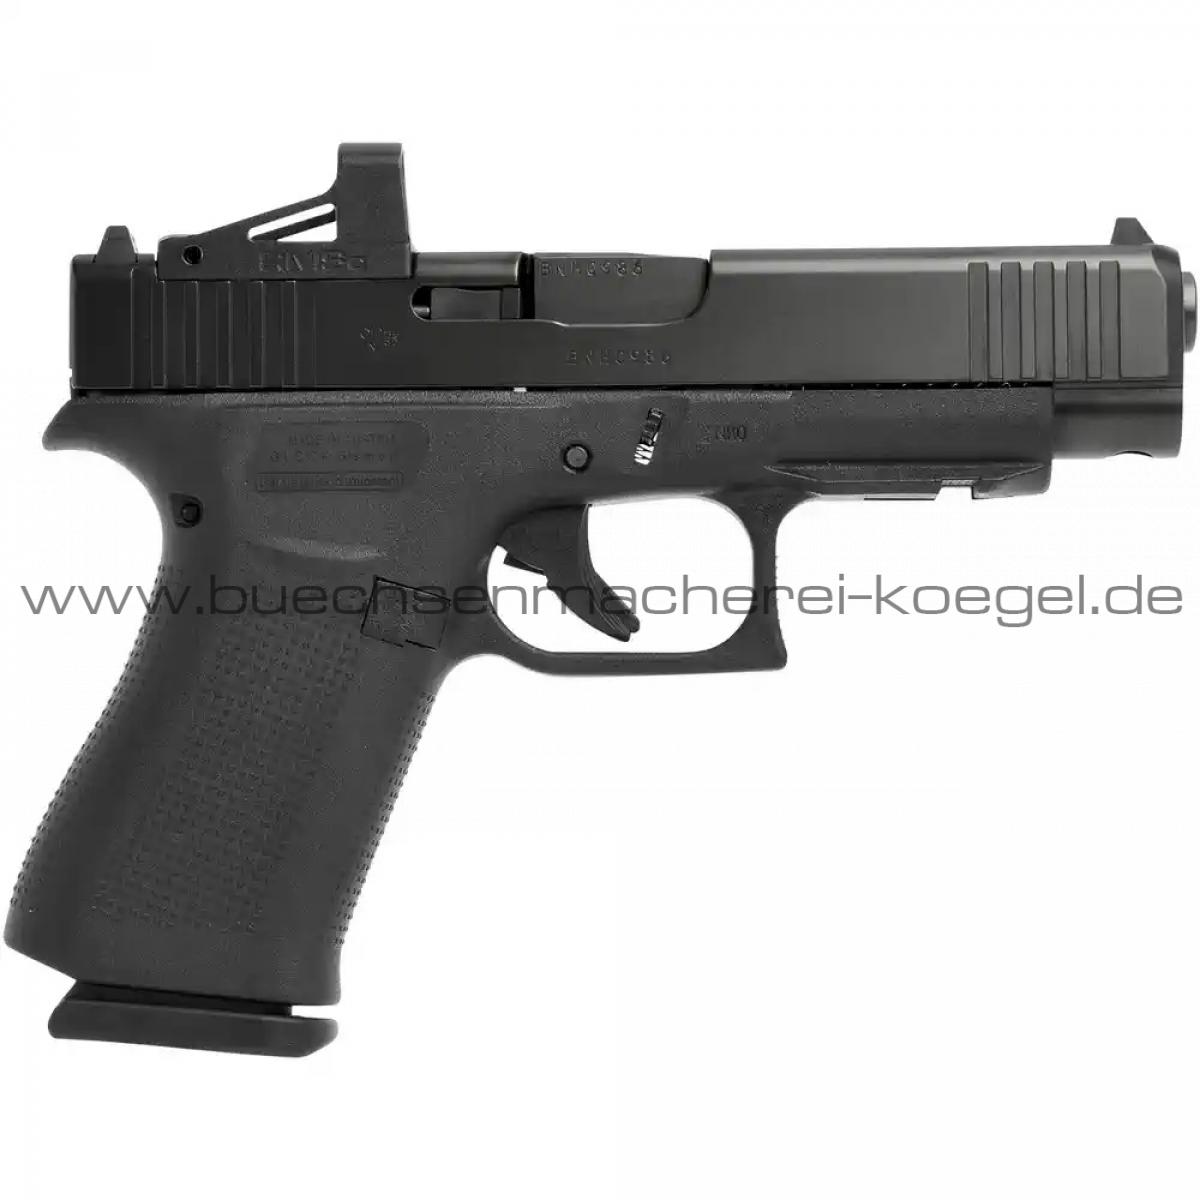 Glock 48 X MOS mit montiertem RMSc Shield Red Dot